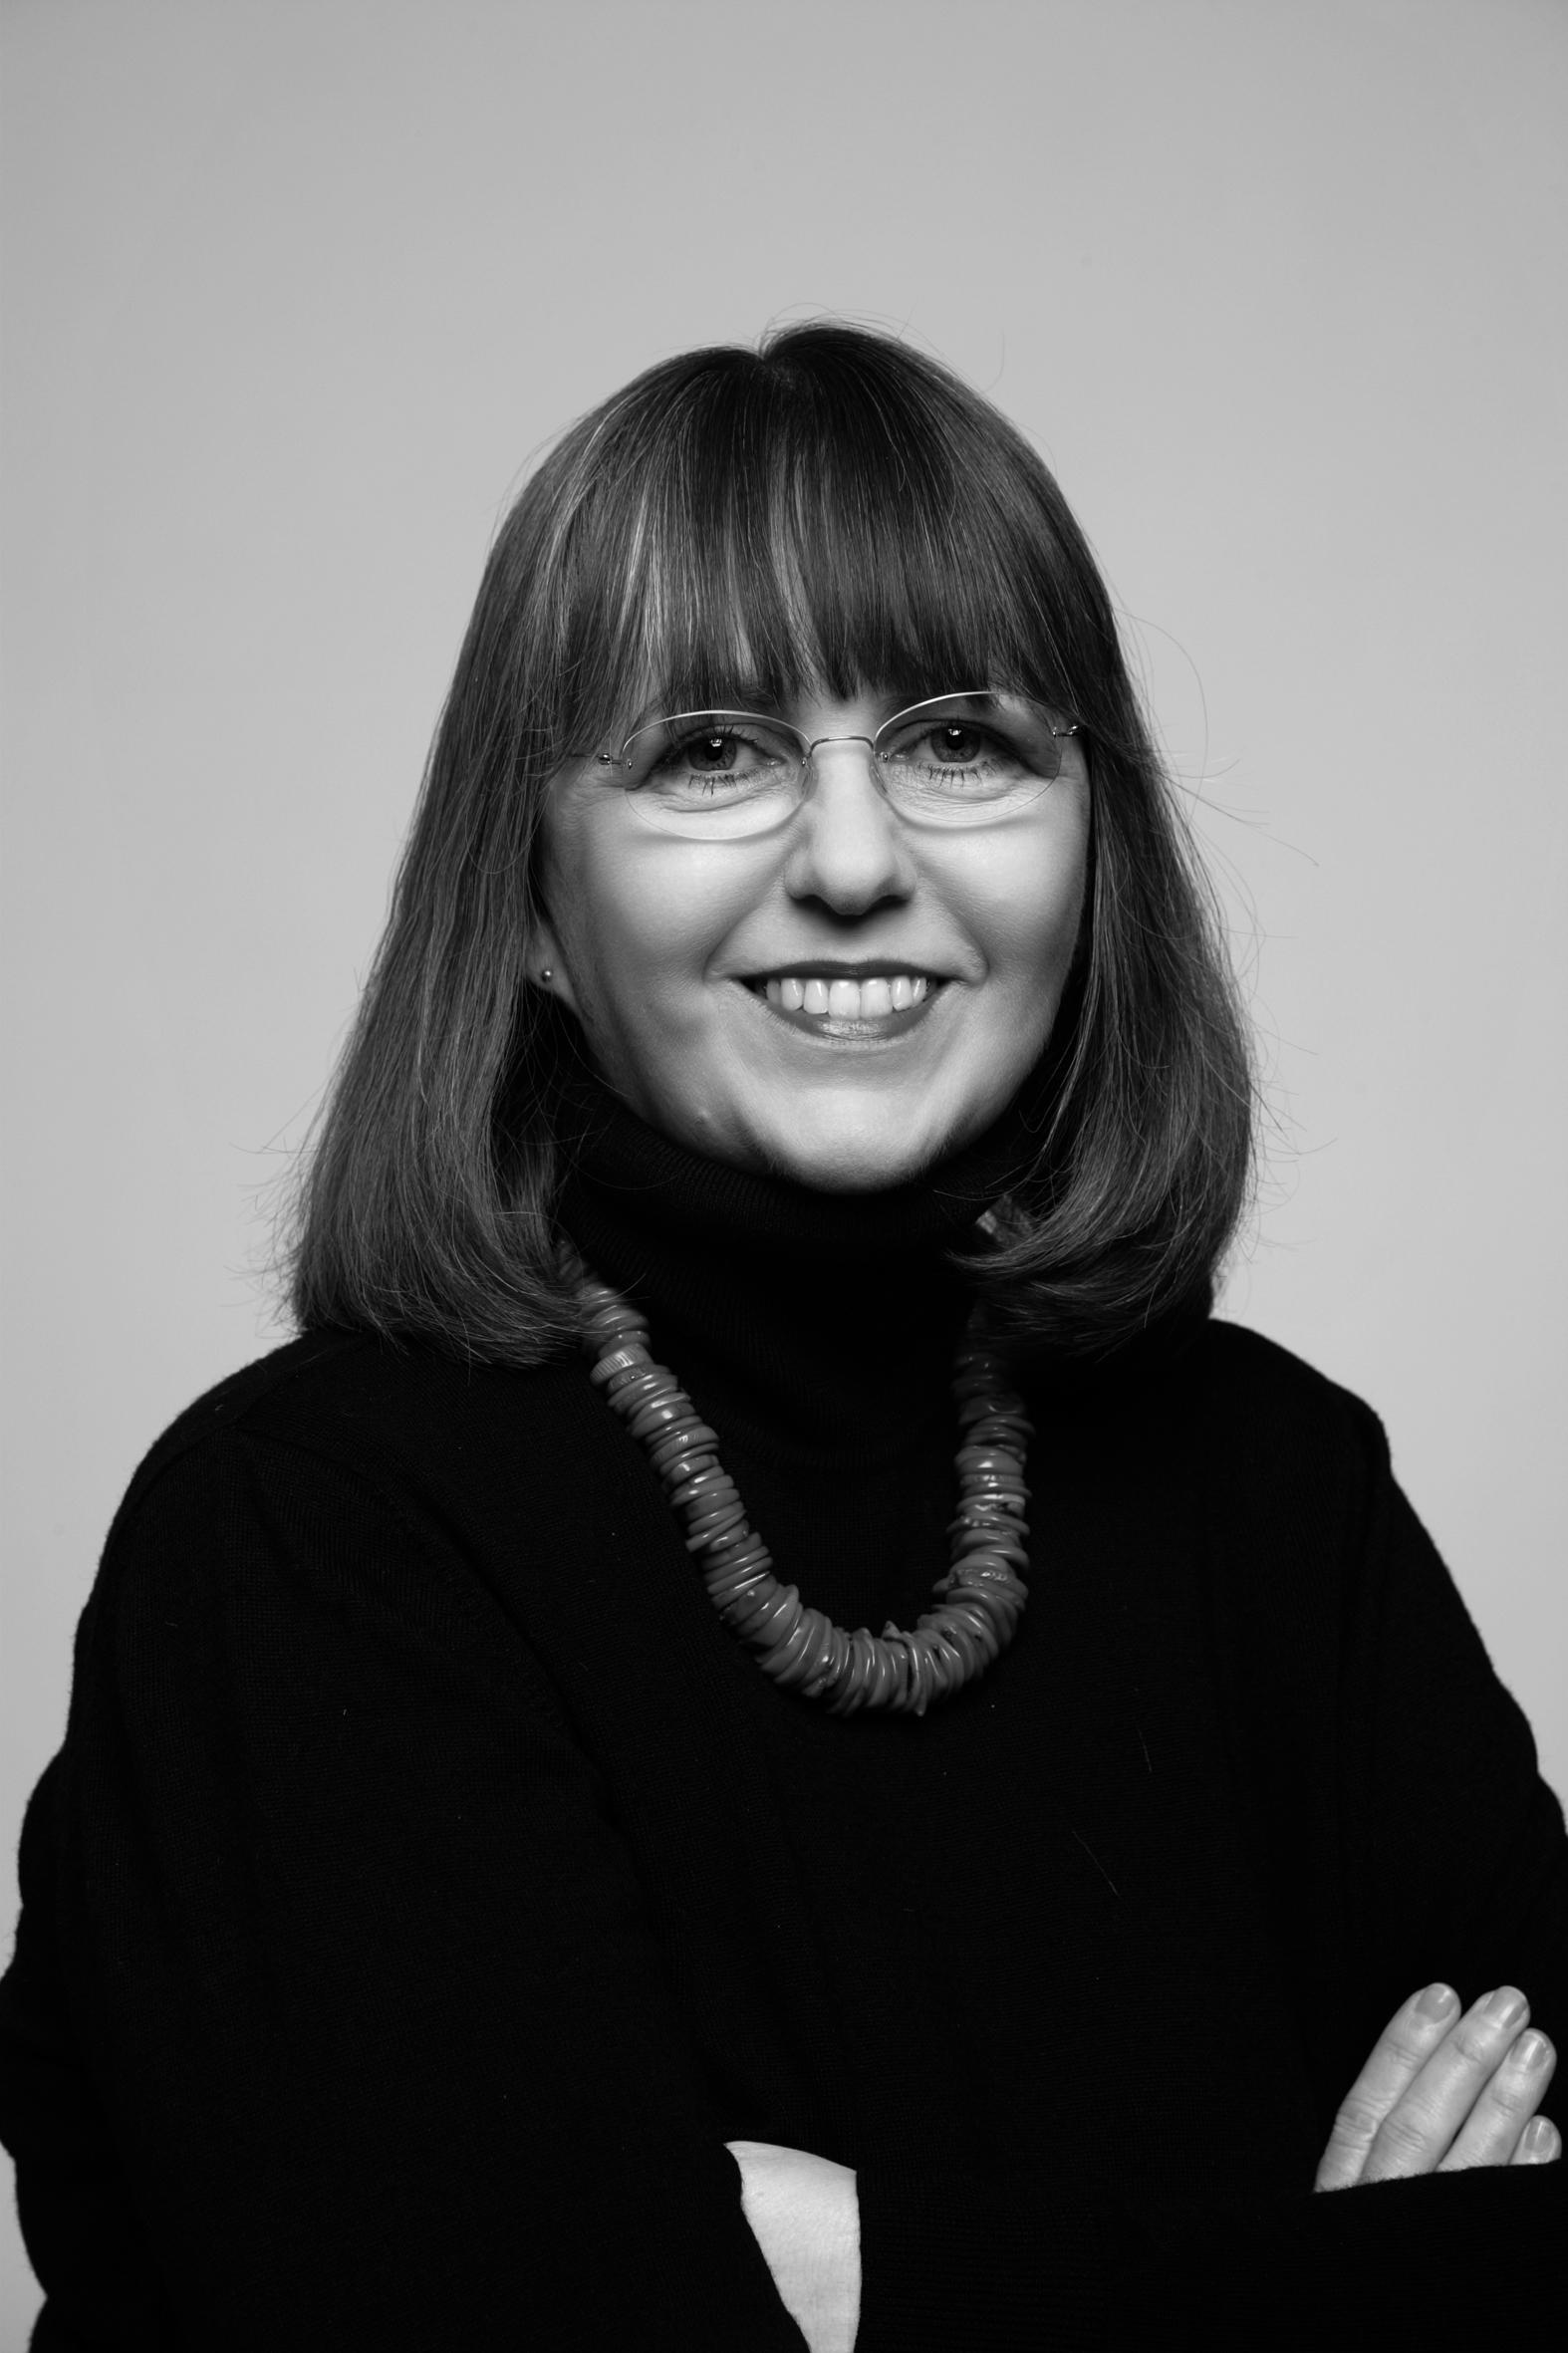 Jónína Leósdóttir